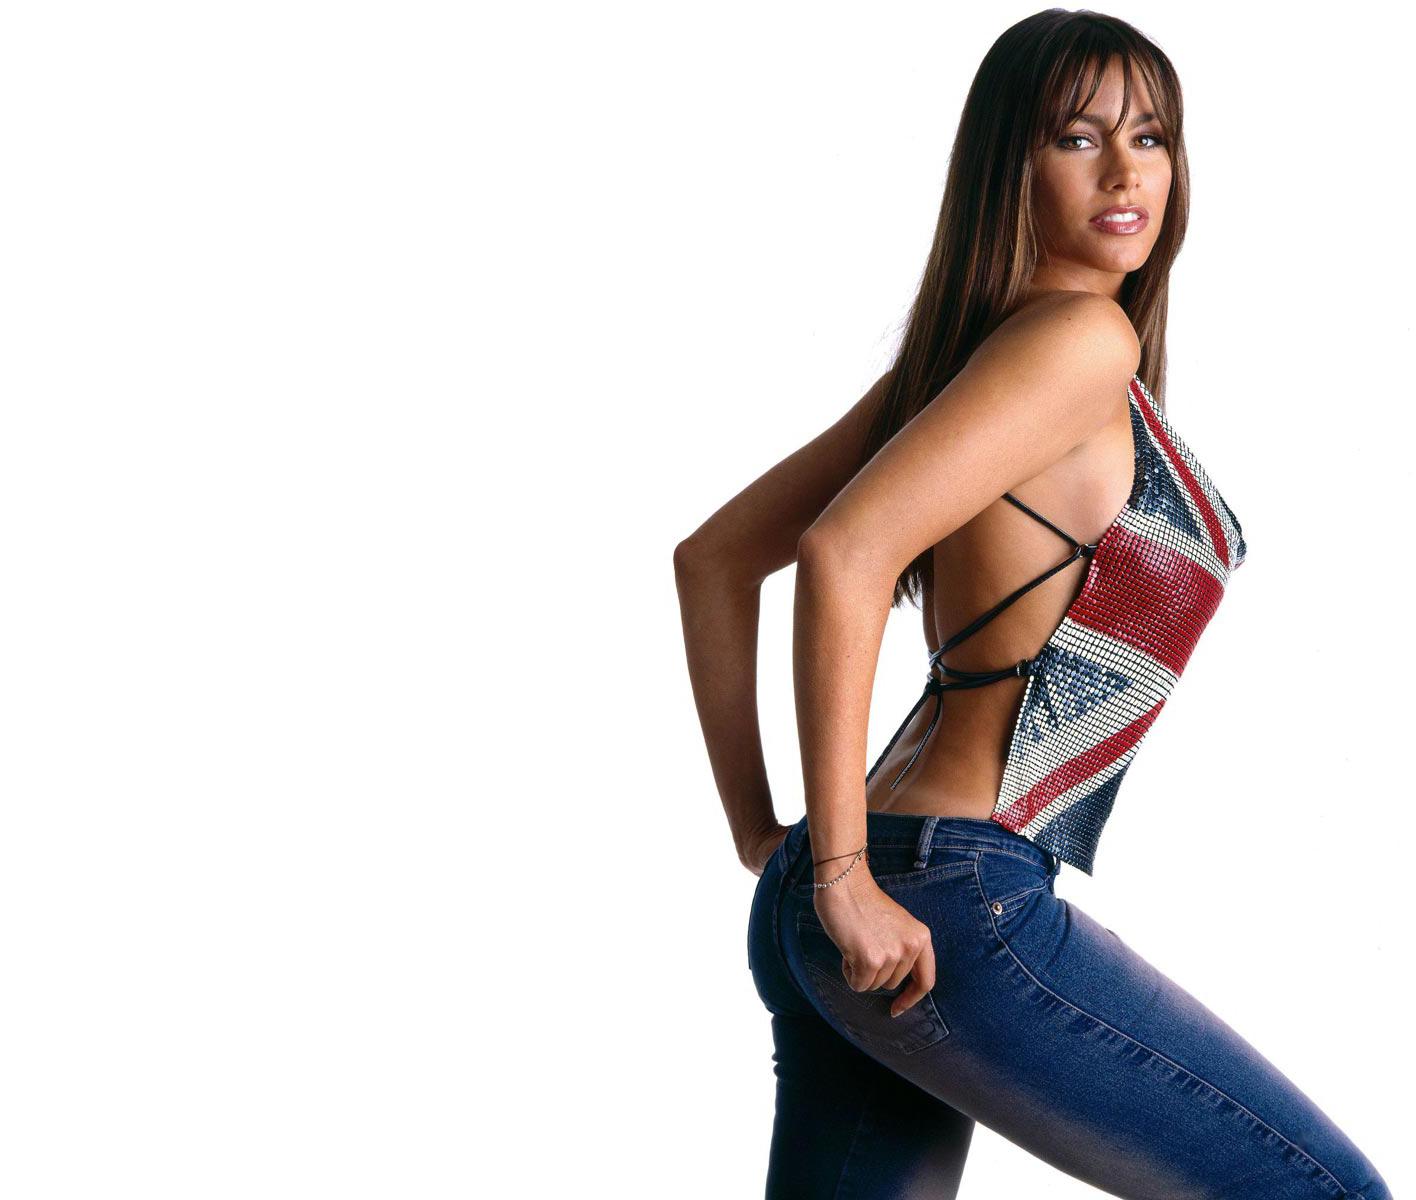 Hot Bio Celebrity Pictures Sofia Vergara New Hd Wallpapers 1416x1200